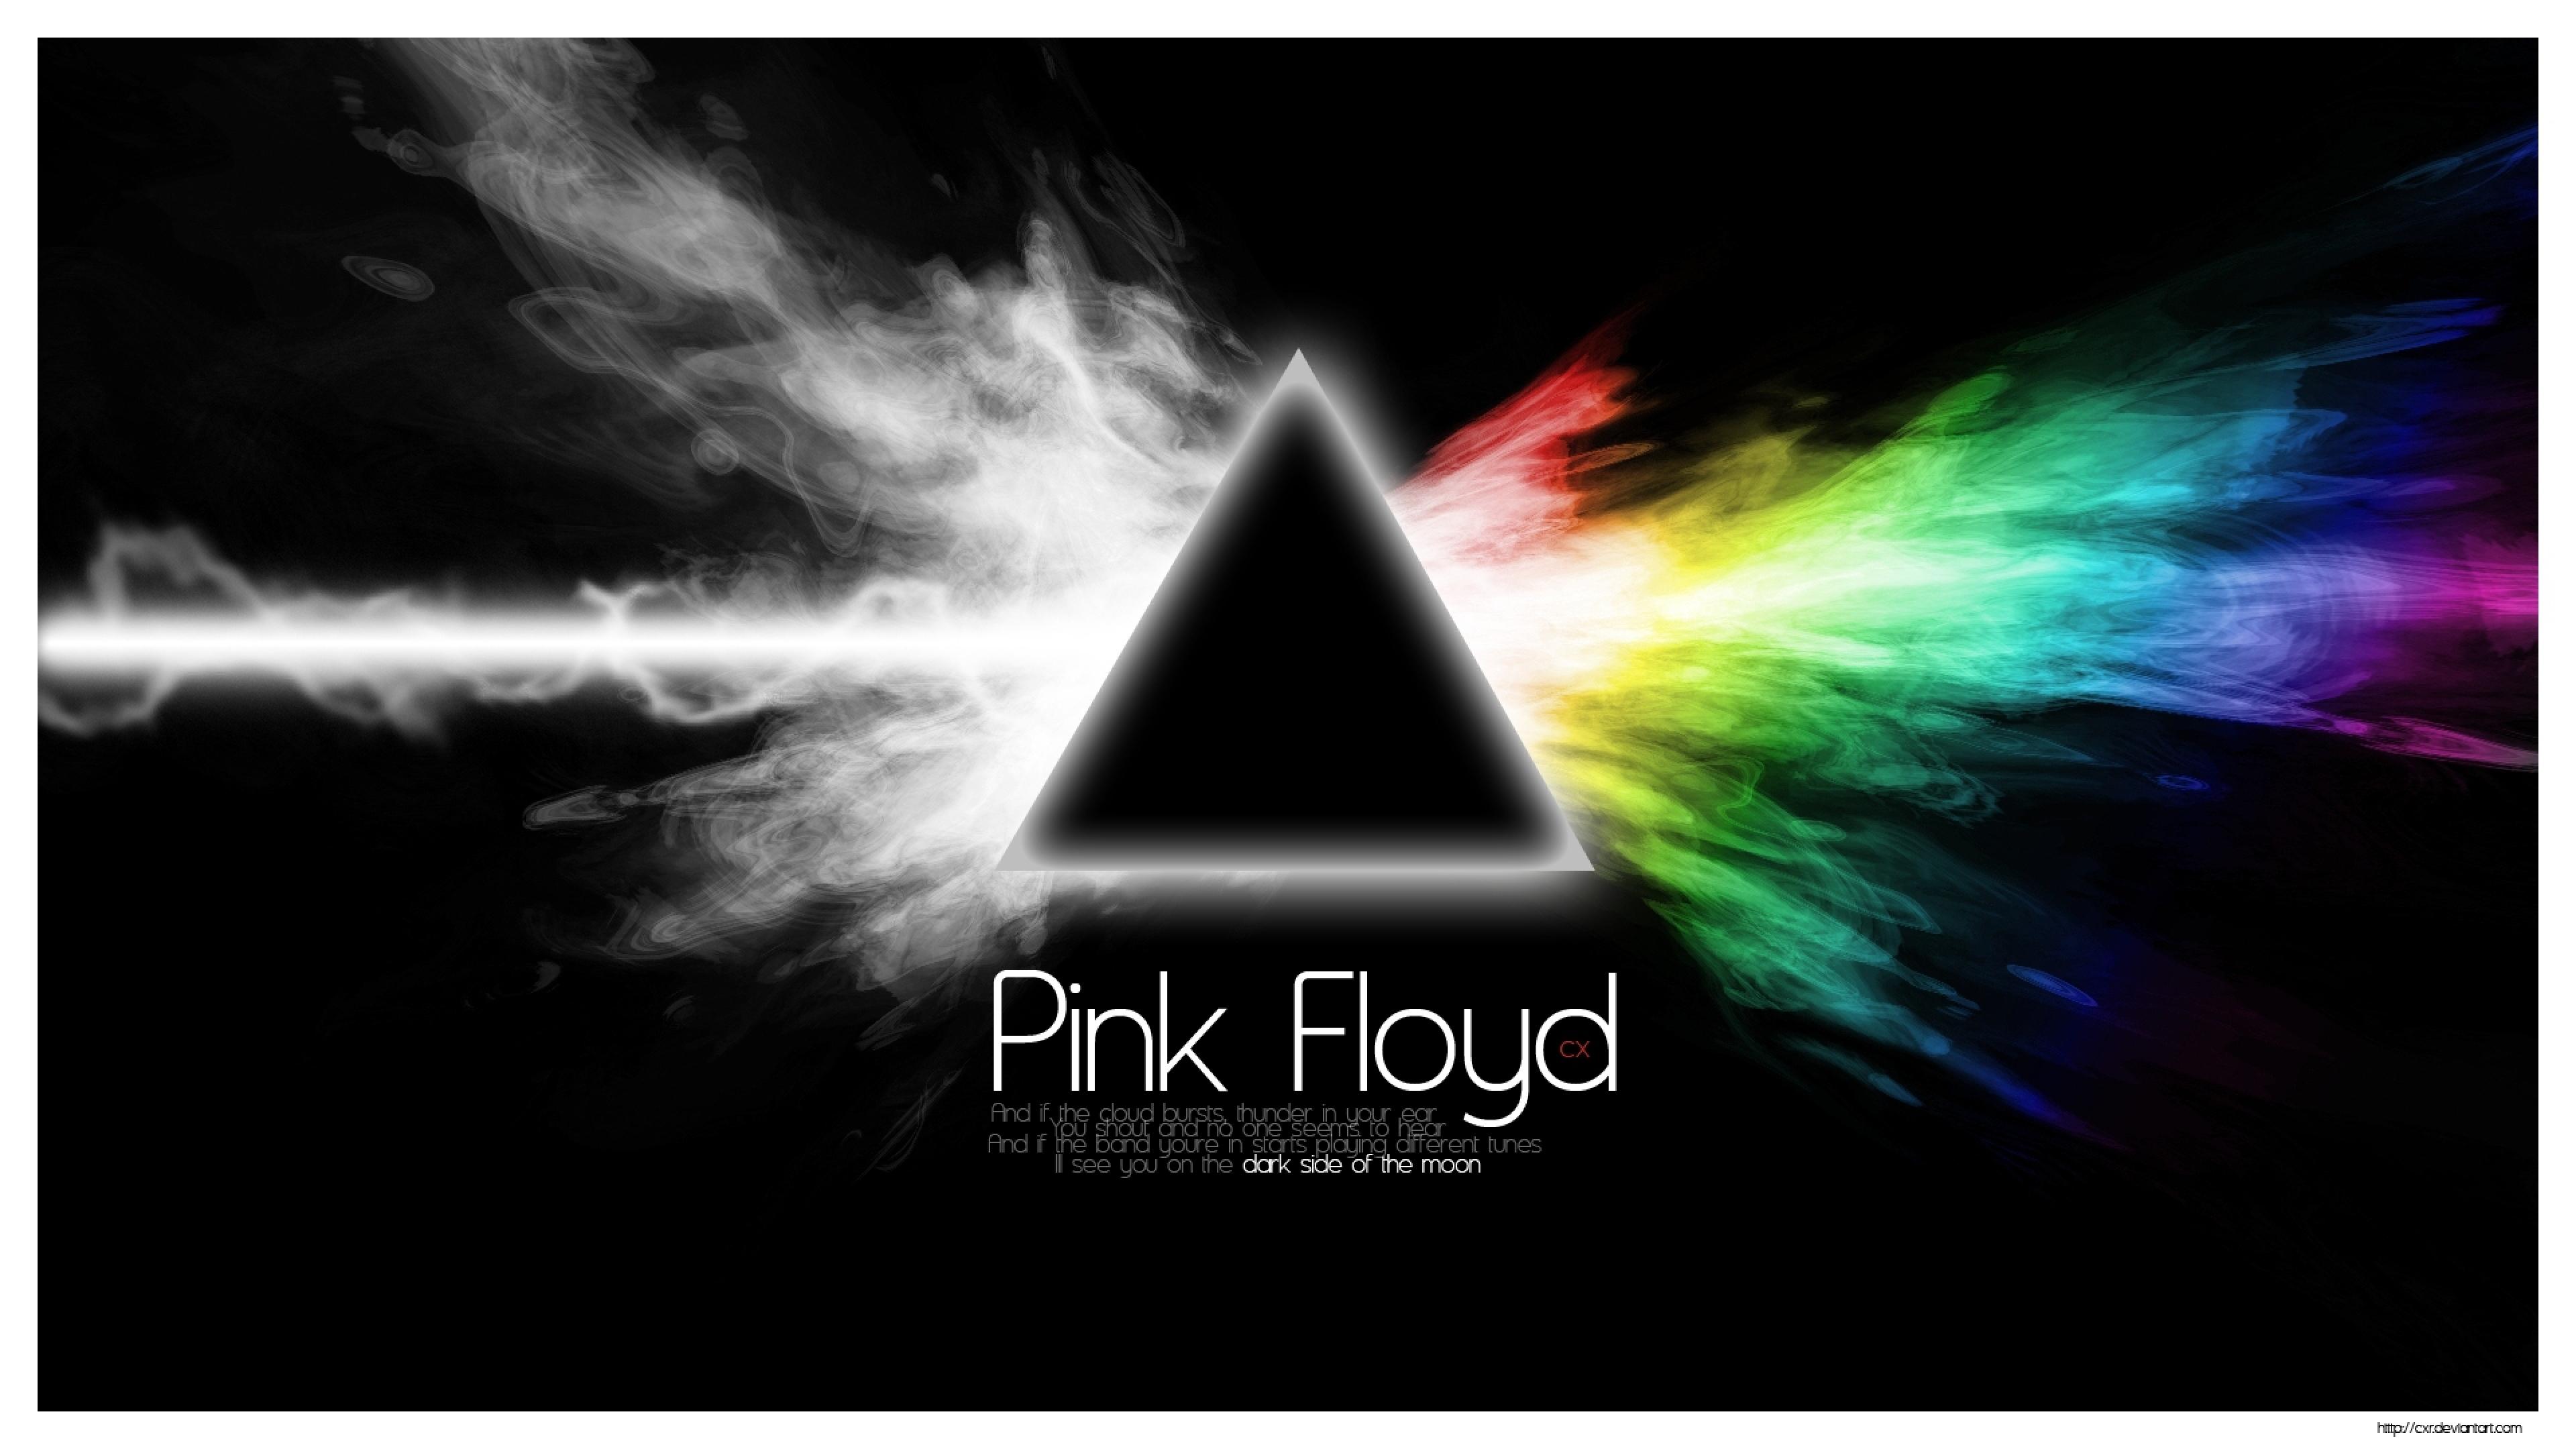 Download HD Pink Floyd Background 3840x2160